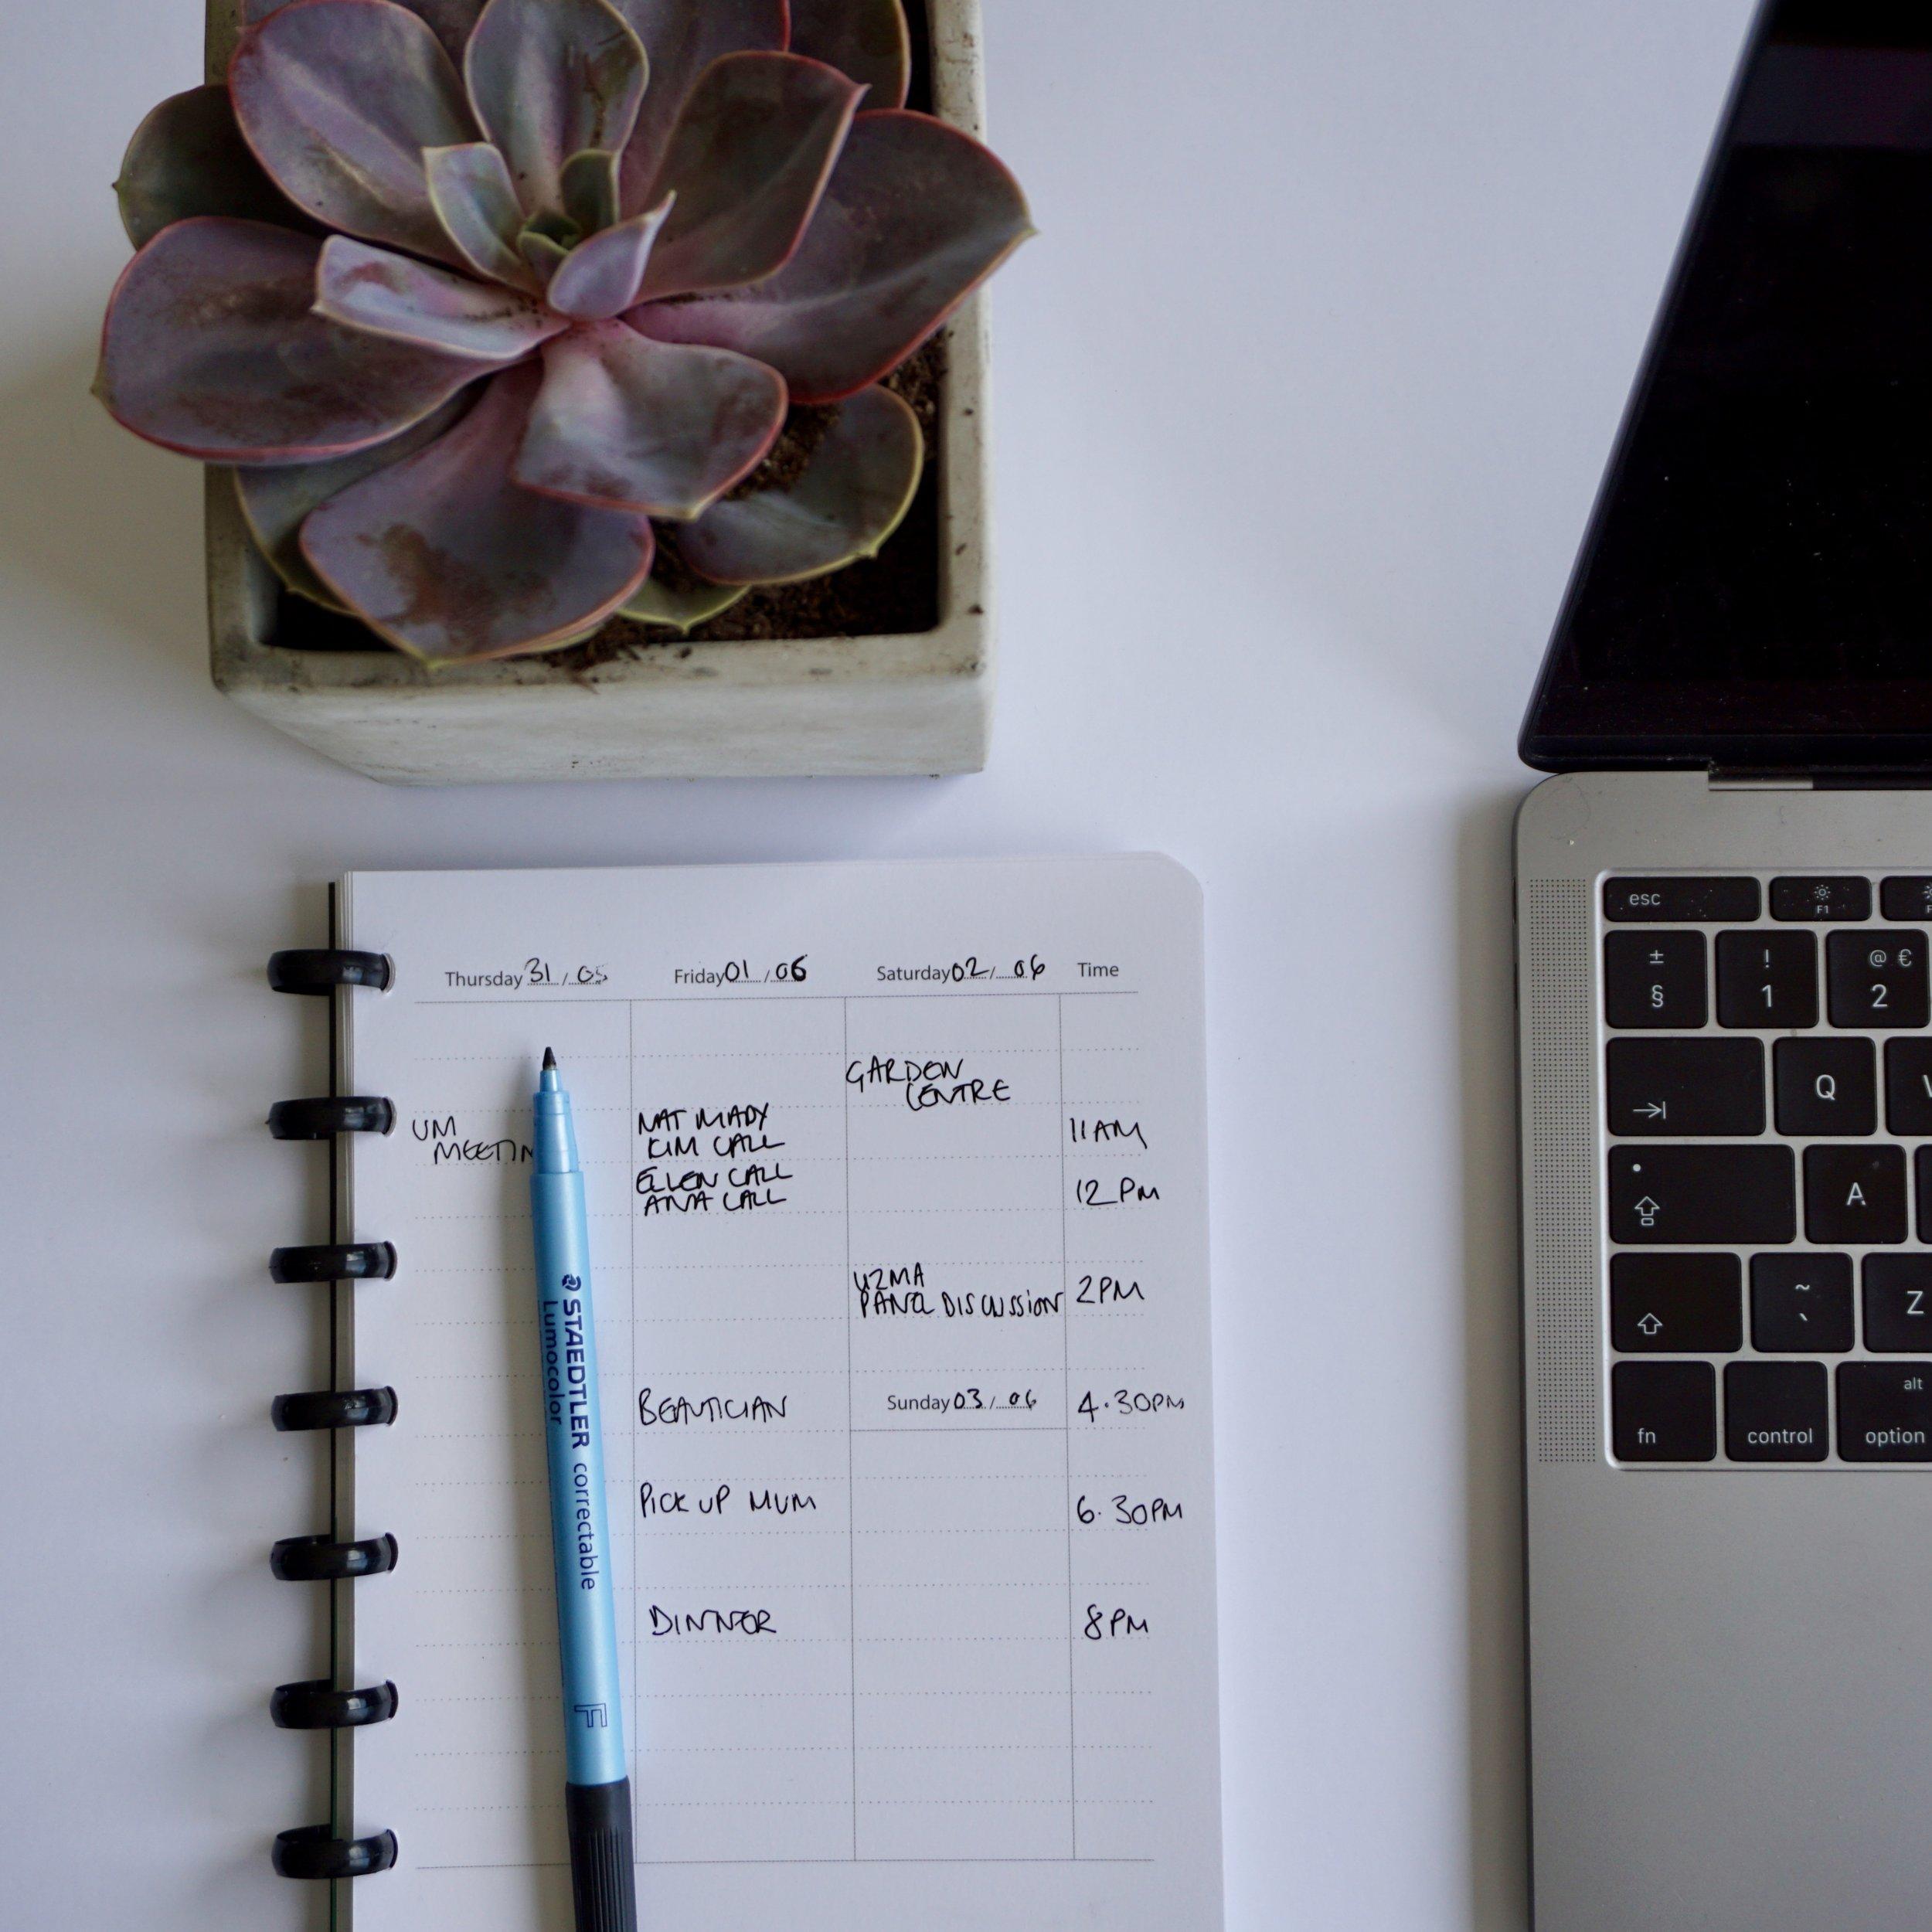 Greenbook weekly planner from Greenstory